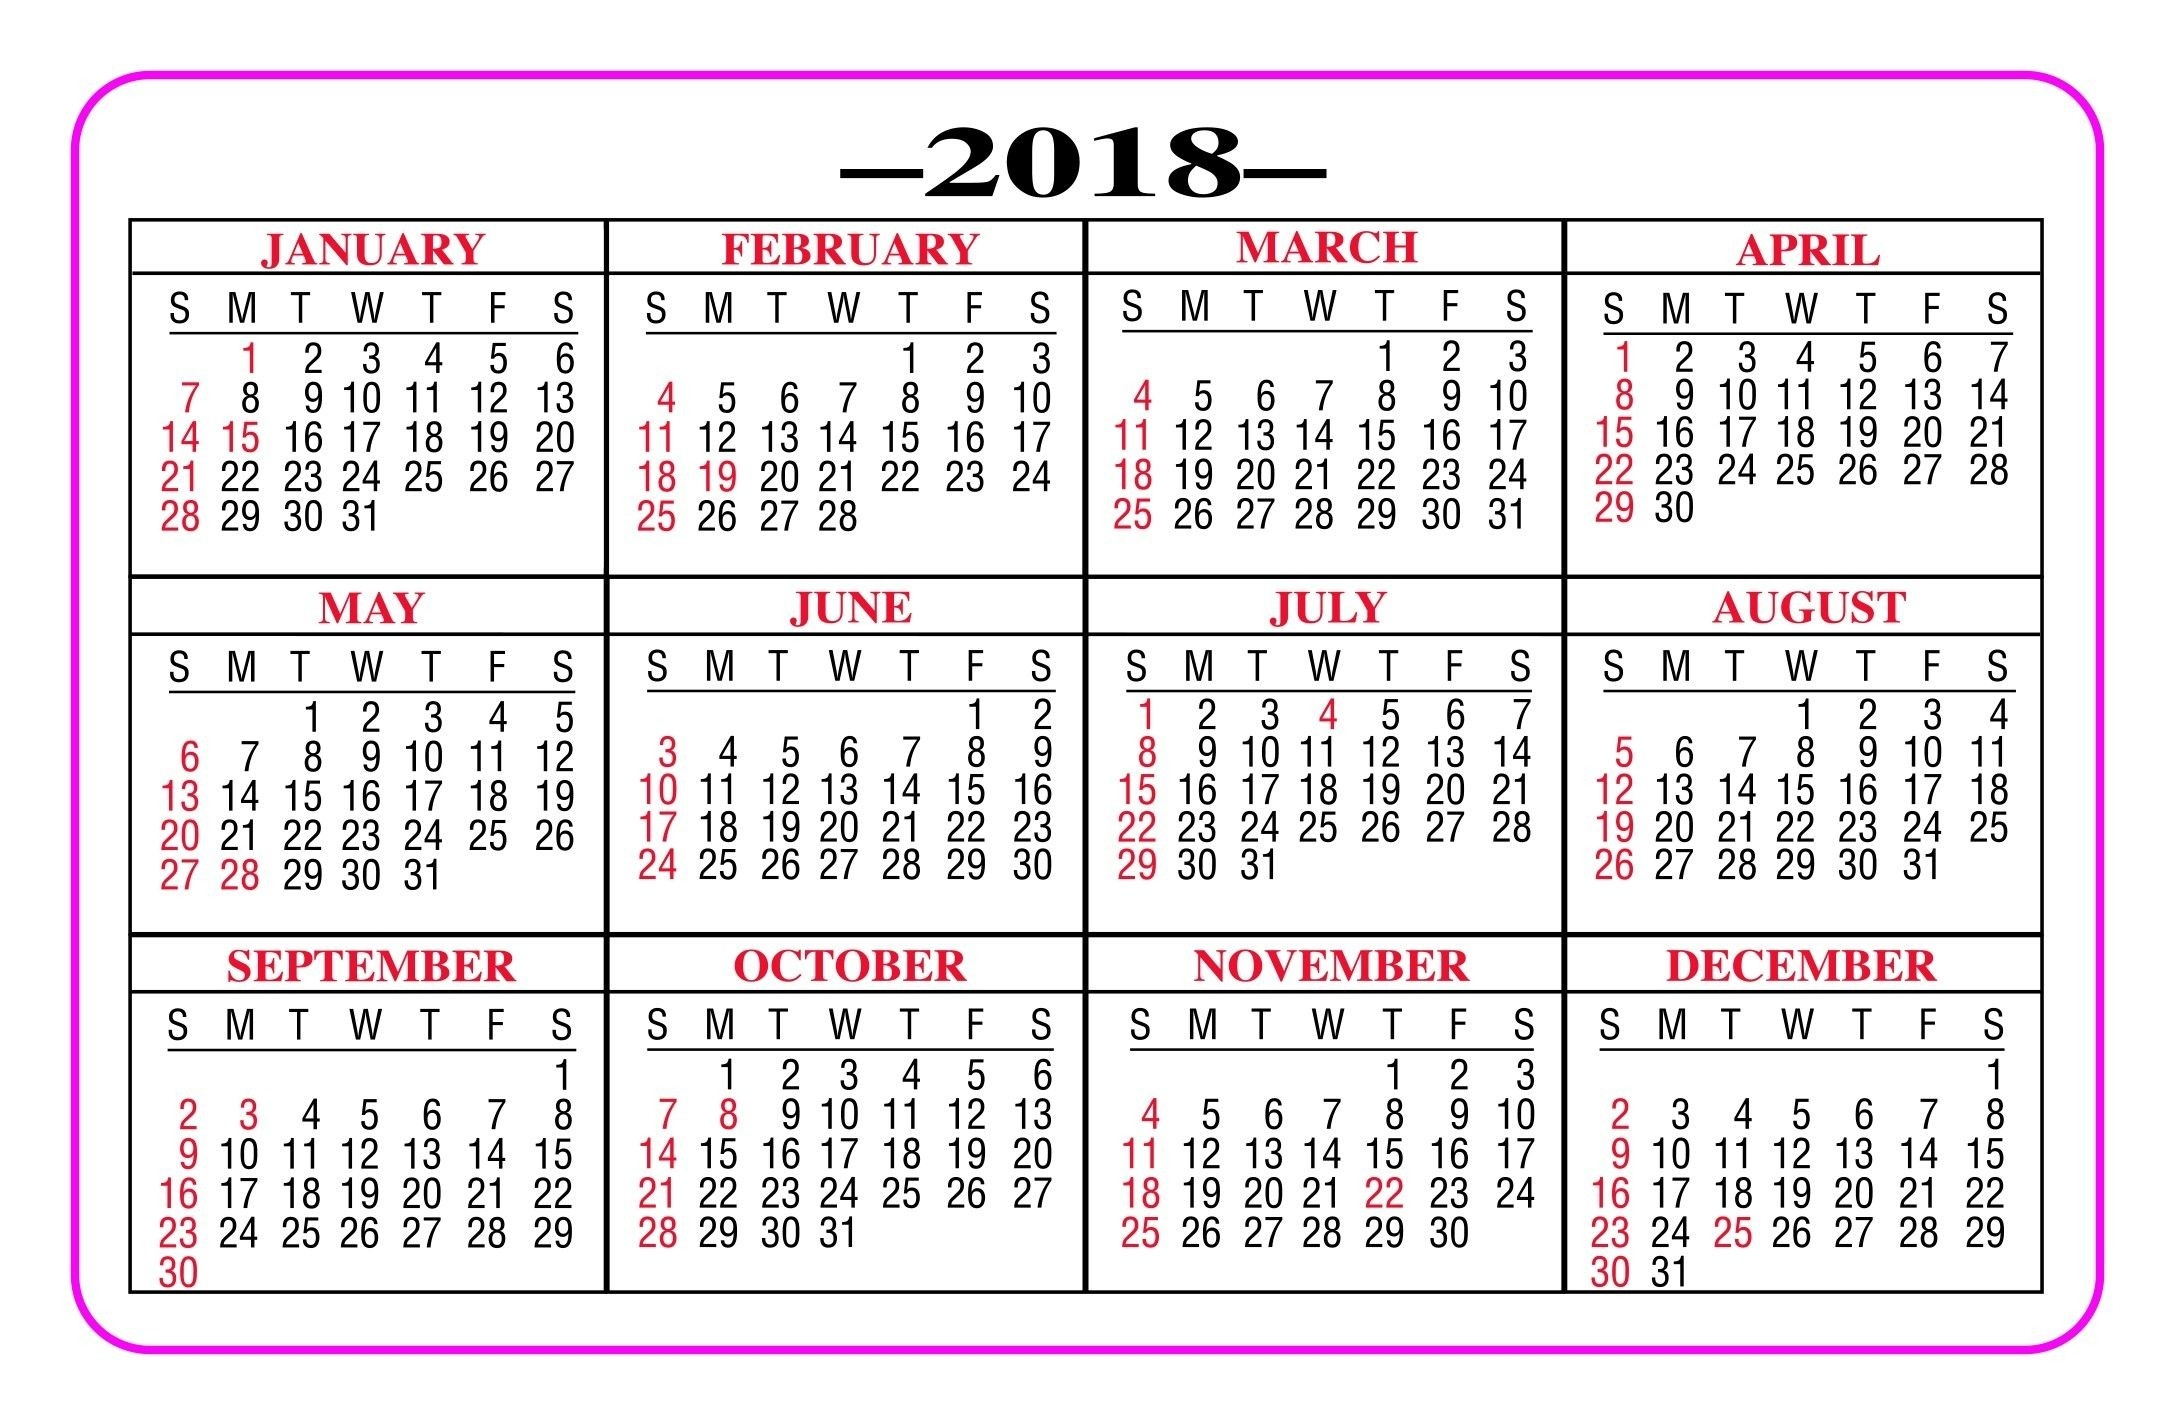 Printable Pocket Calendar 2018 - Yeniscale.co Full Year-2 Year Pocket Calendar Template